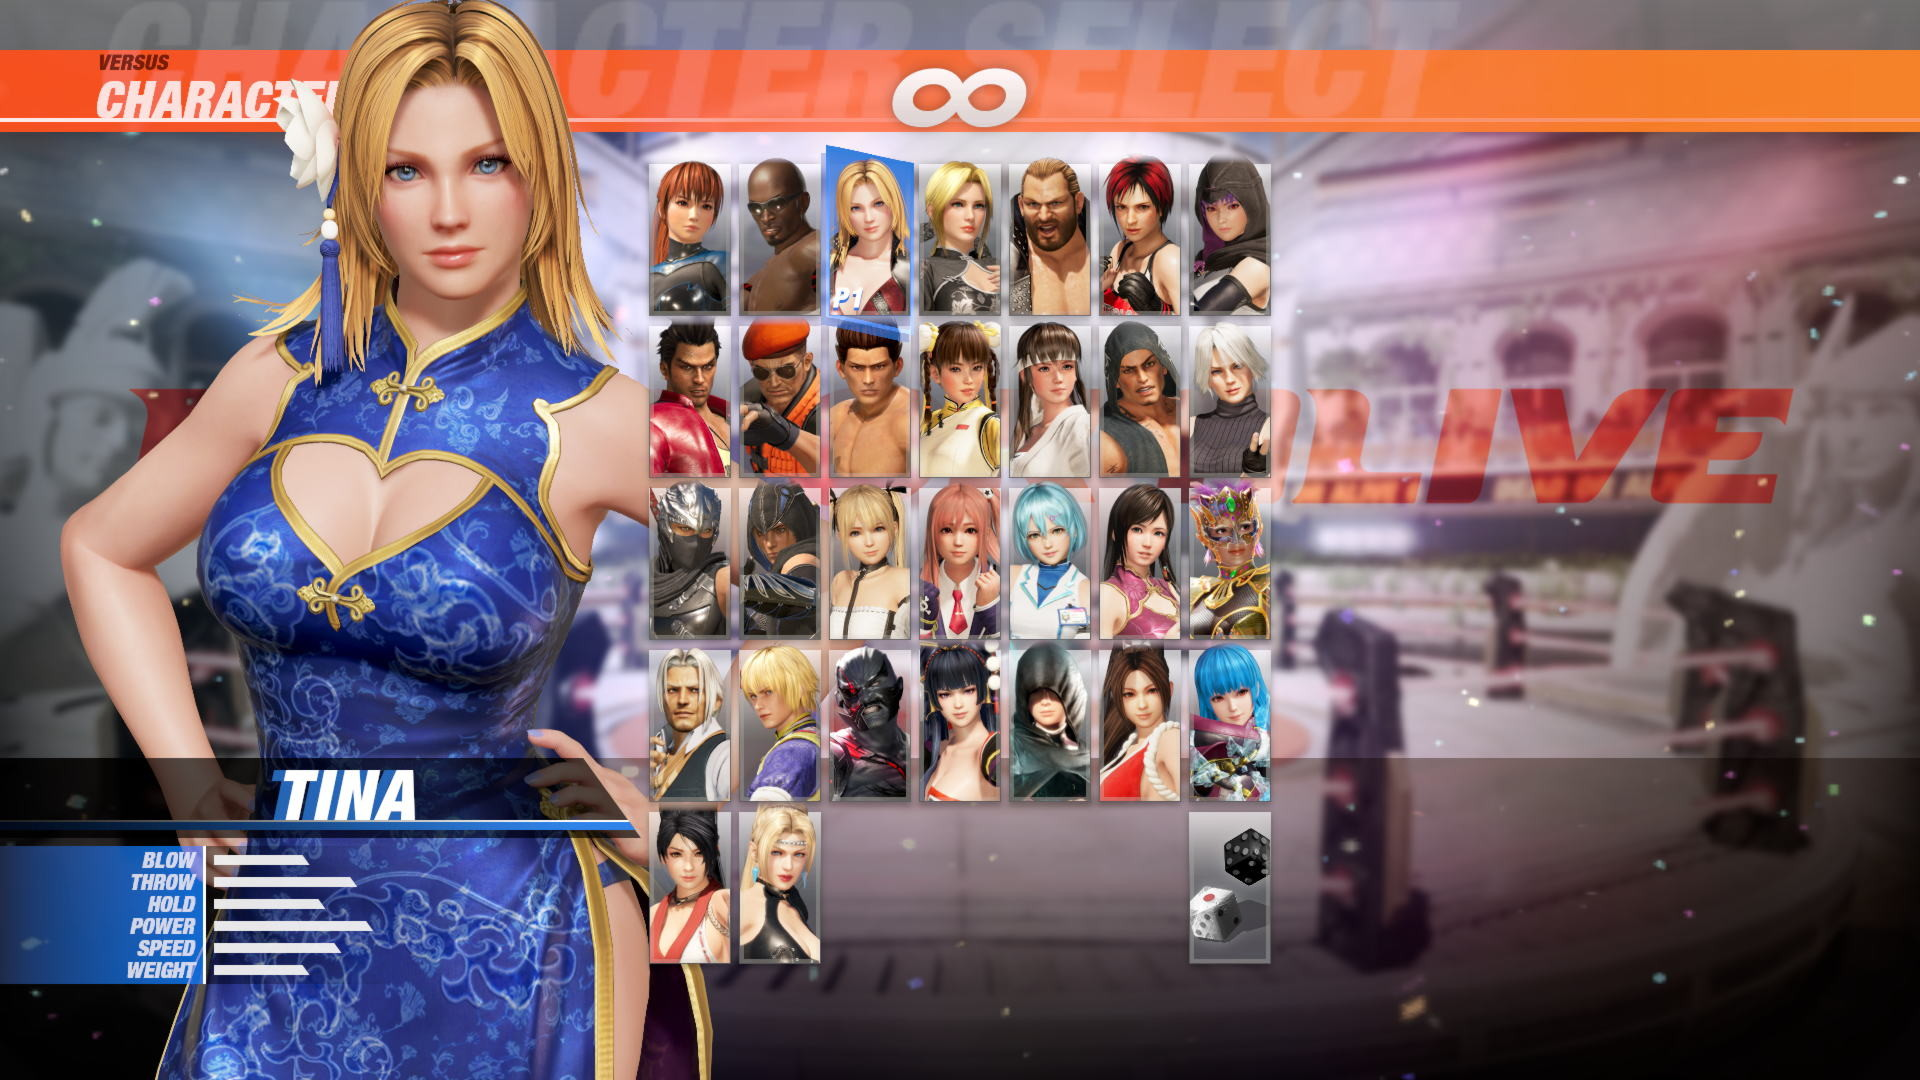 [Revival] DOA6 Alluring Mandarin Dress - Tina screenshot